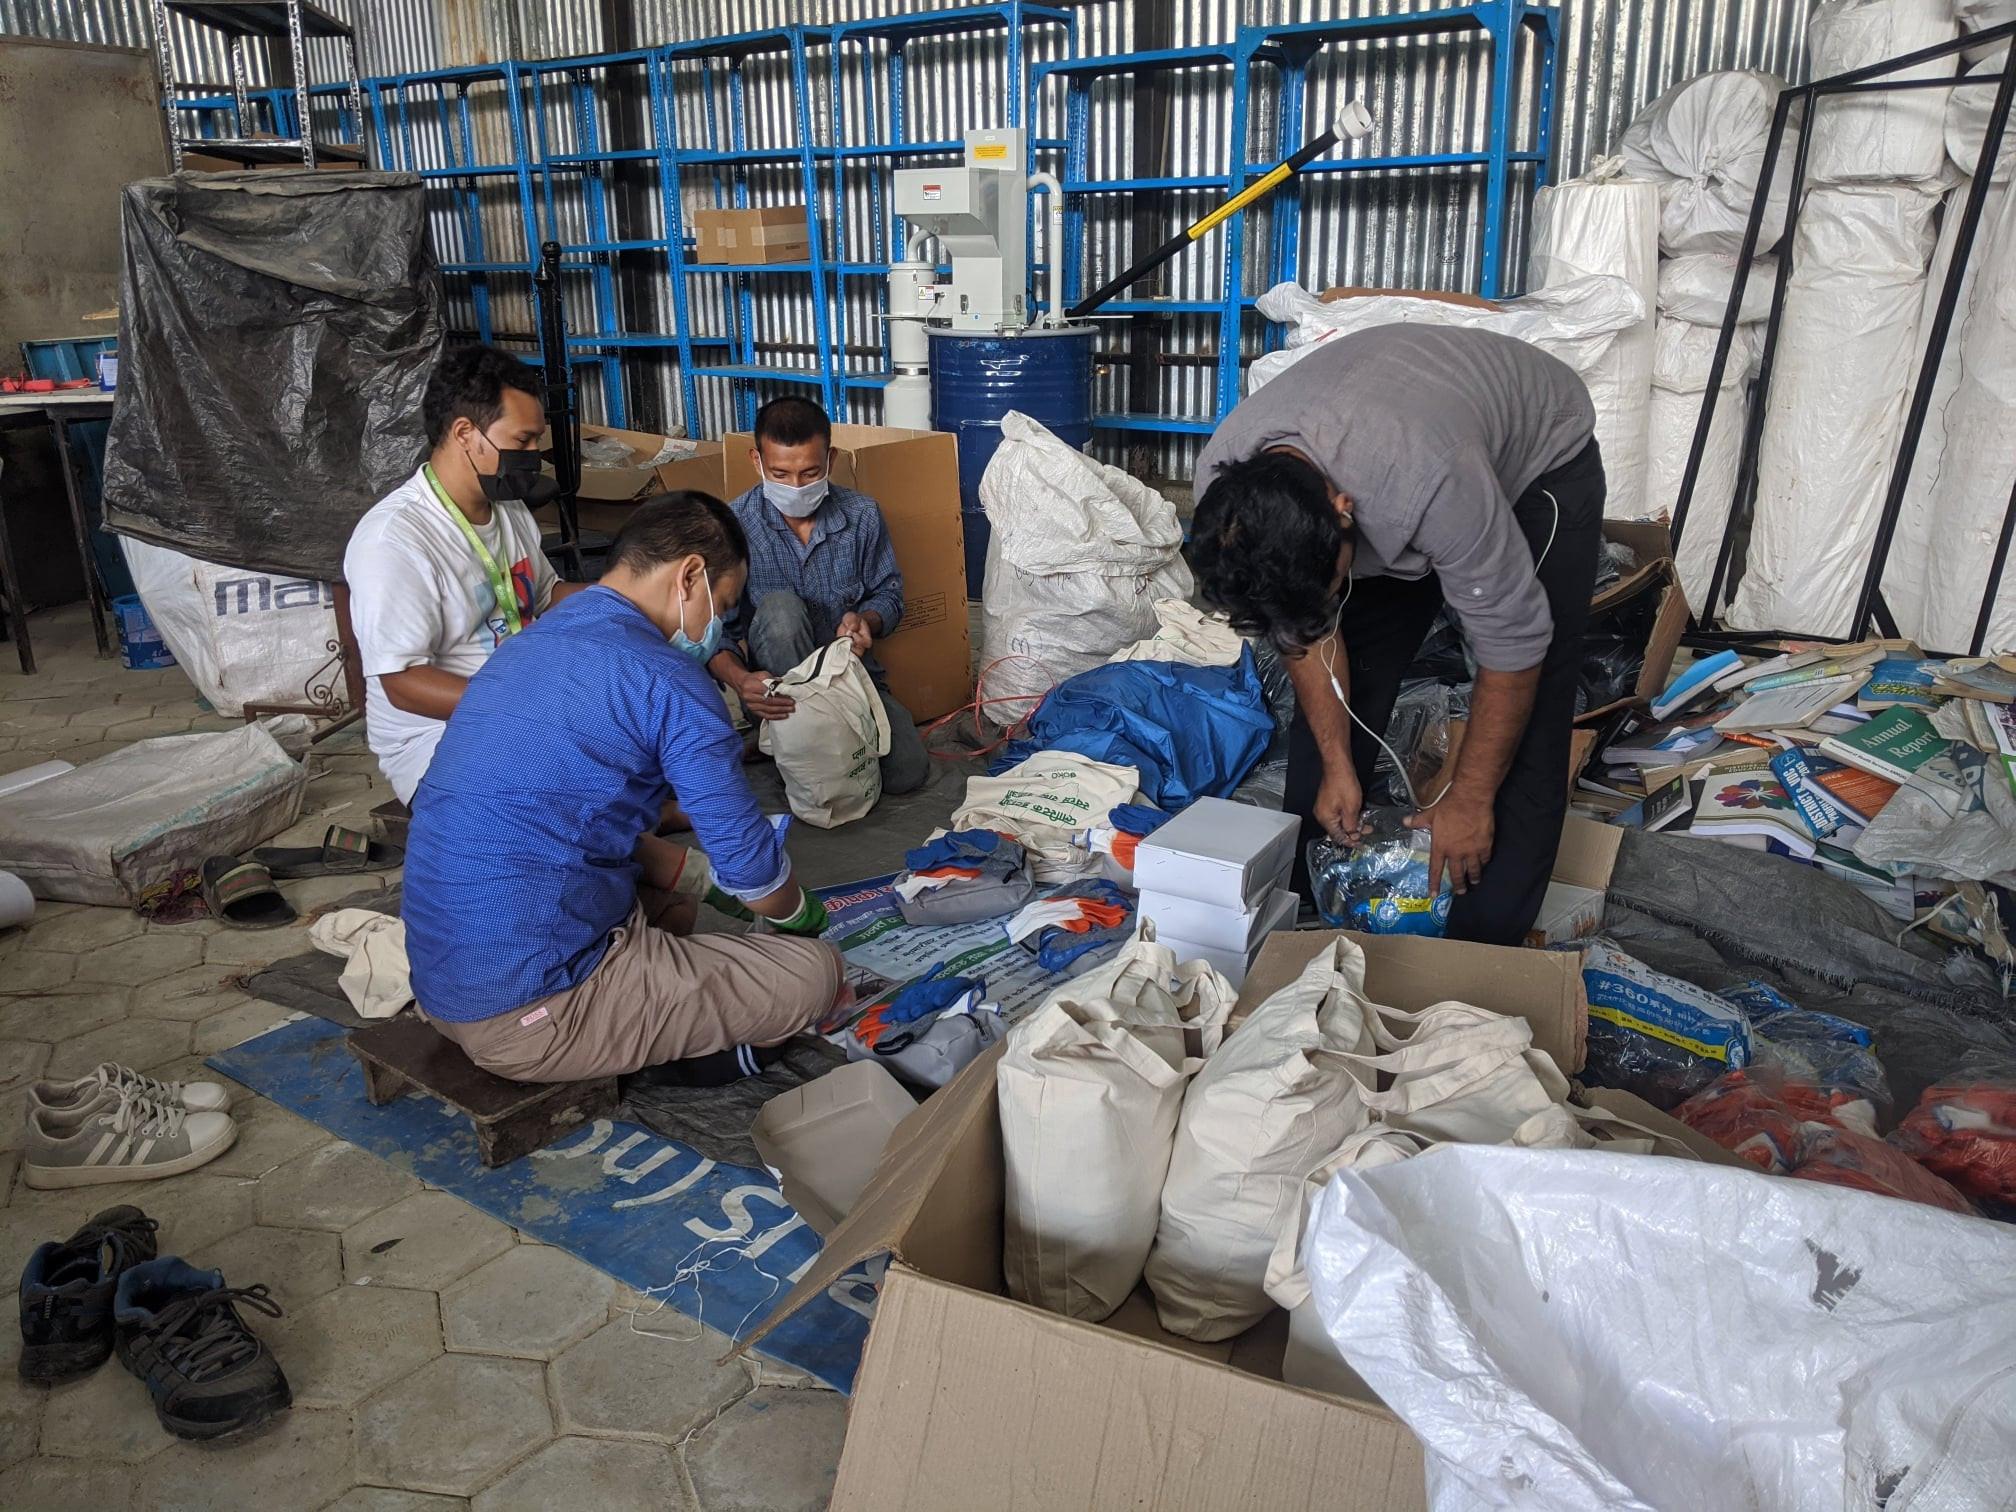 Samman Yogya Mero Kaam5  Album image Doko Recyclers